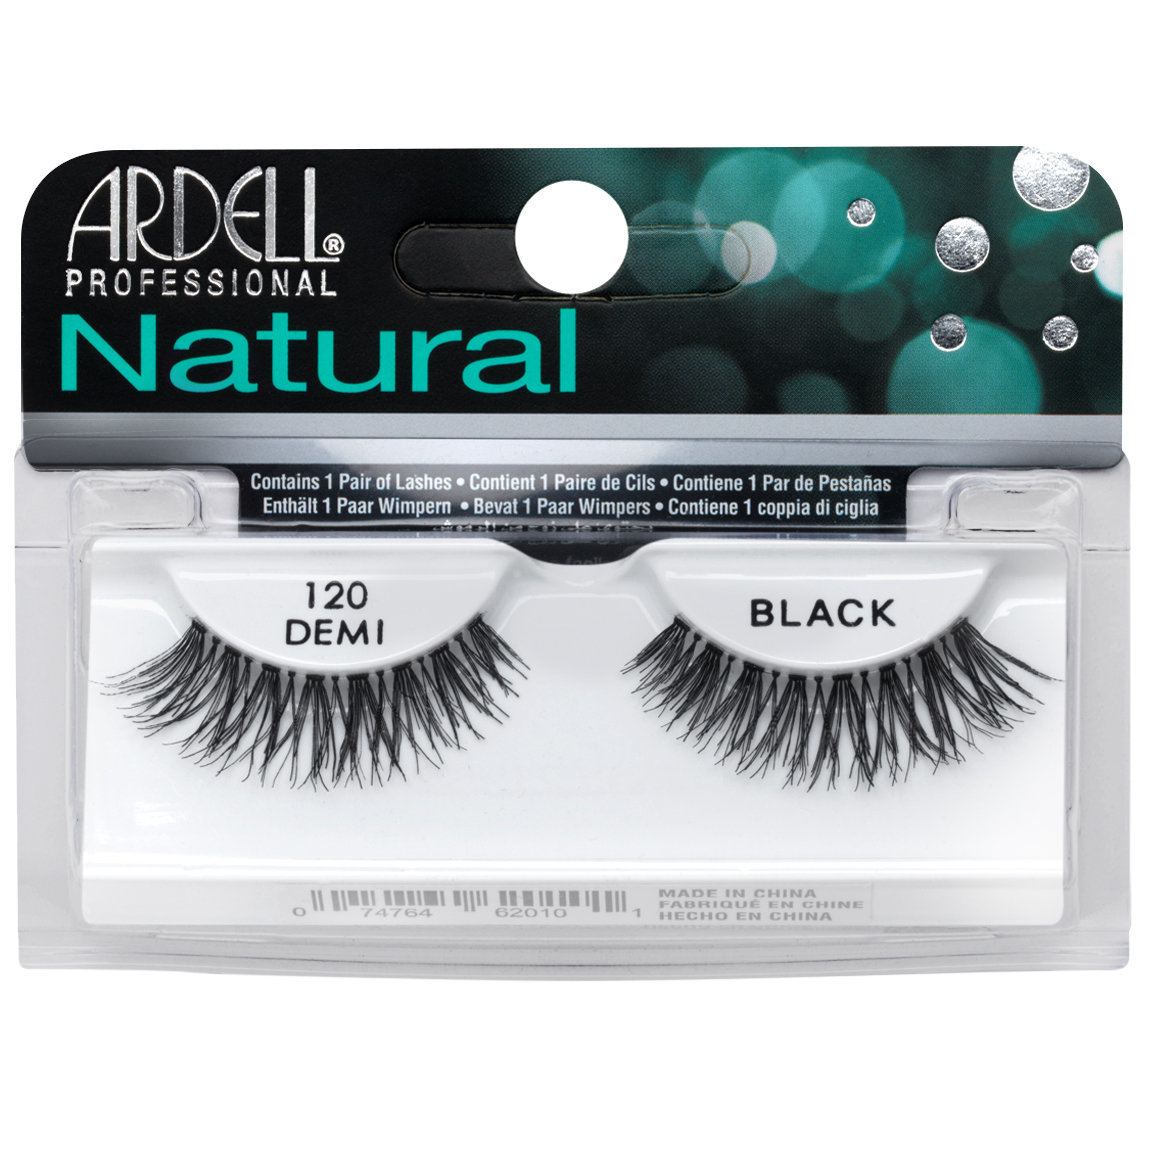 b1098d918f8 Ardell Natural Lashes 120 Demi Black | Beautylish